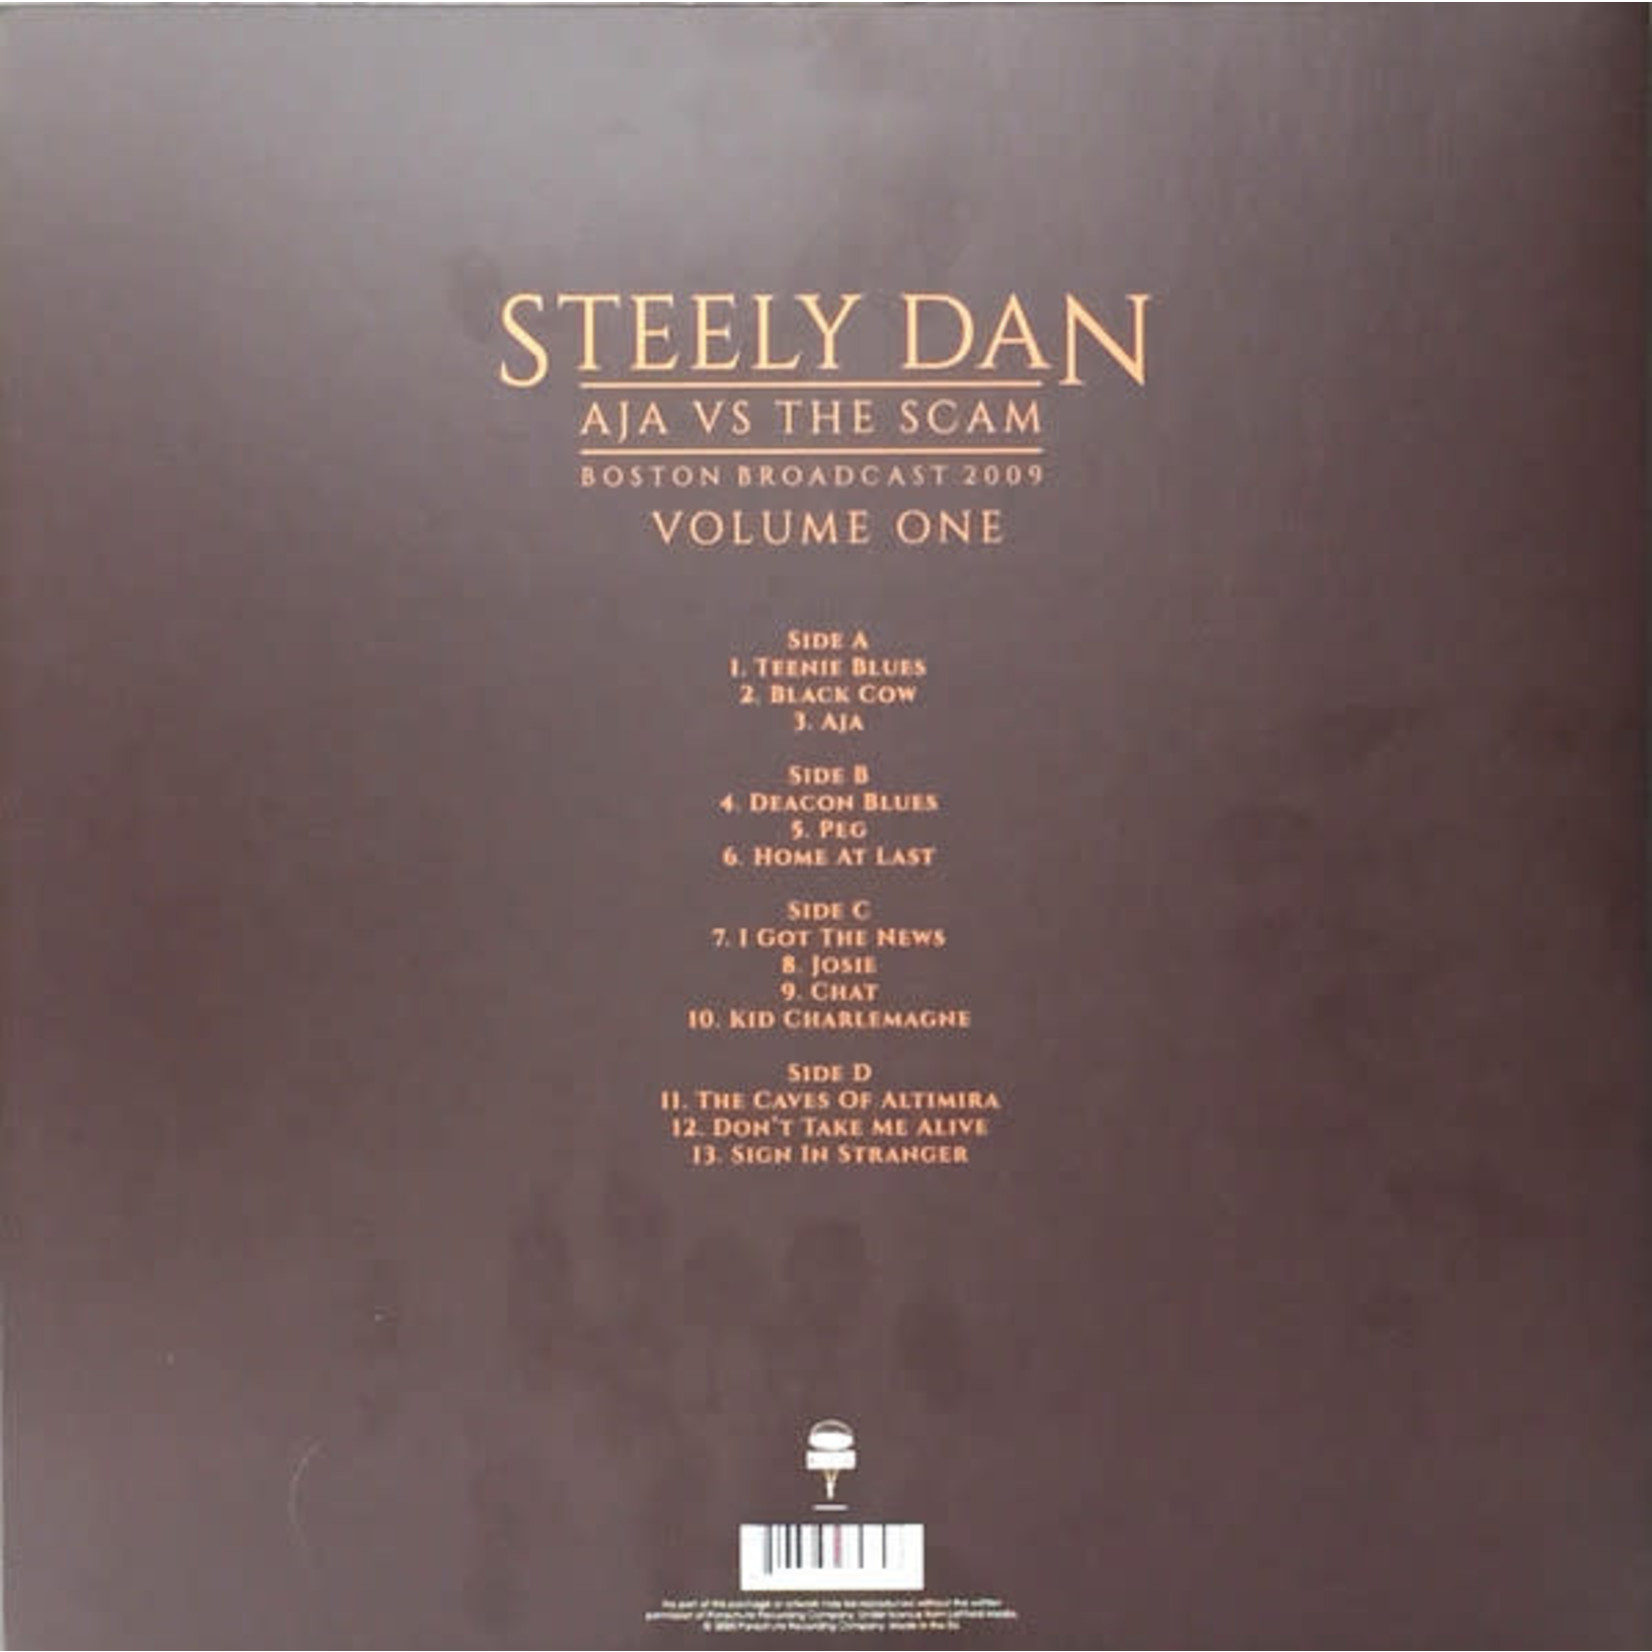 STEELY DAN AJA VS. THE SCAM VOL. 1 (2LP)